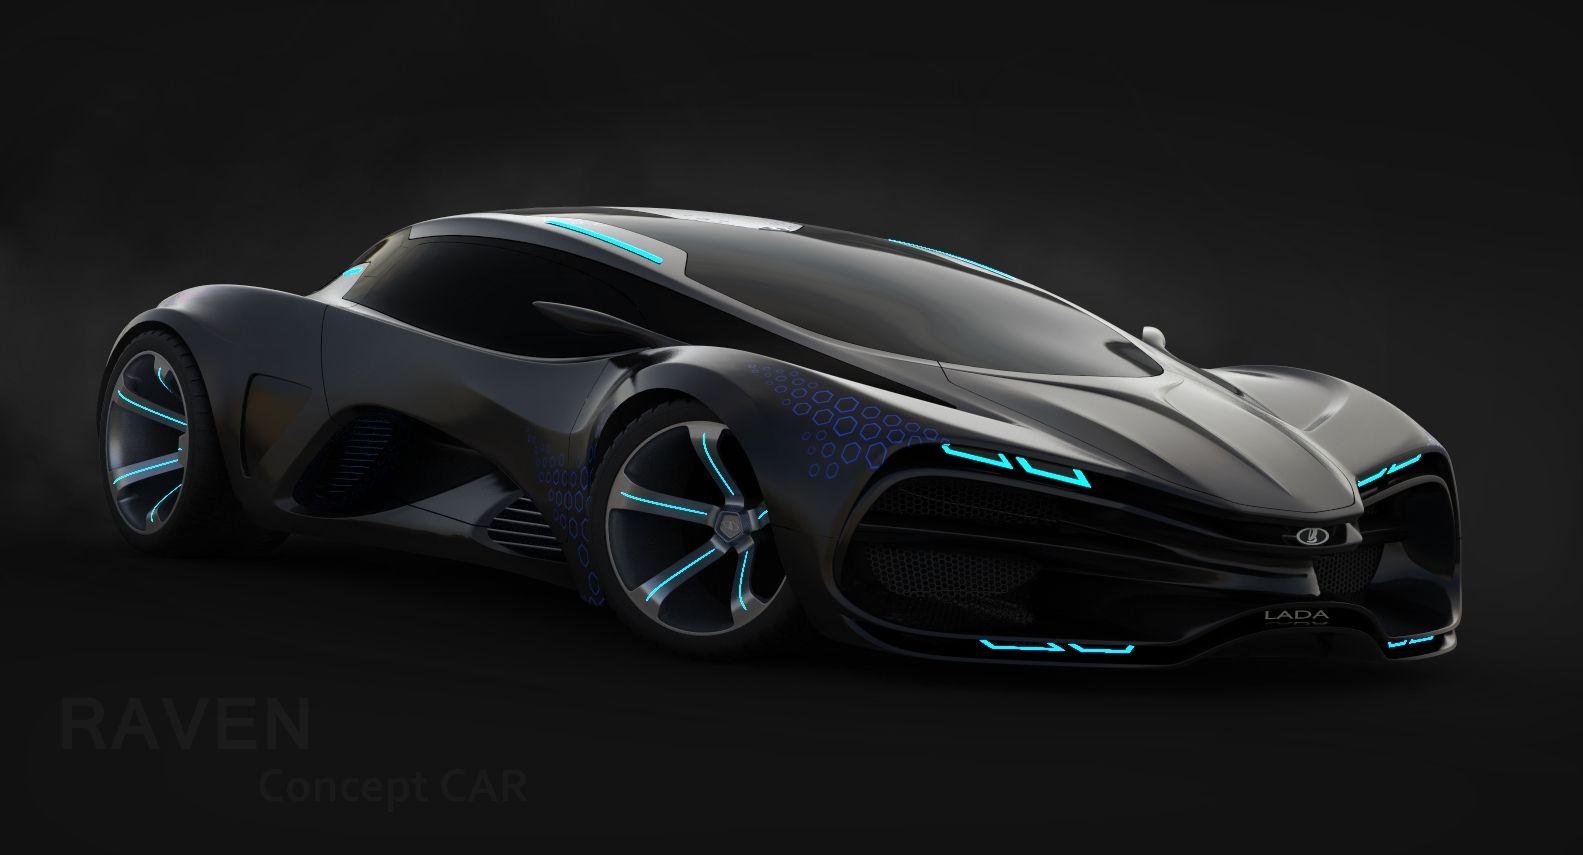 lada raven concept car 2013 купить